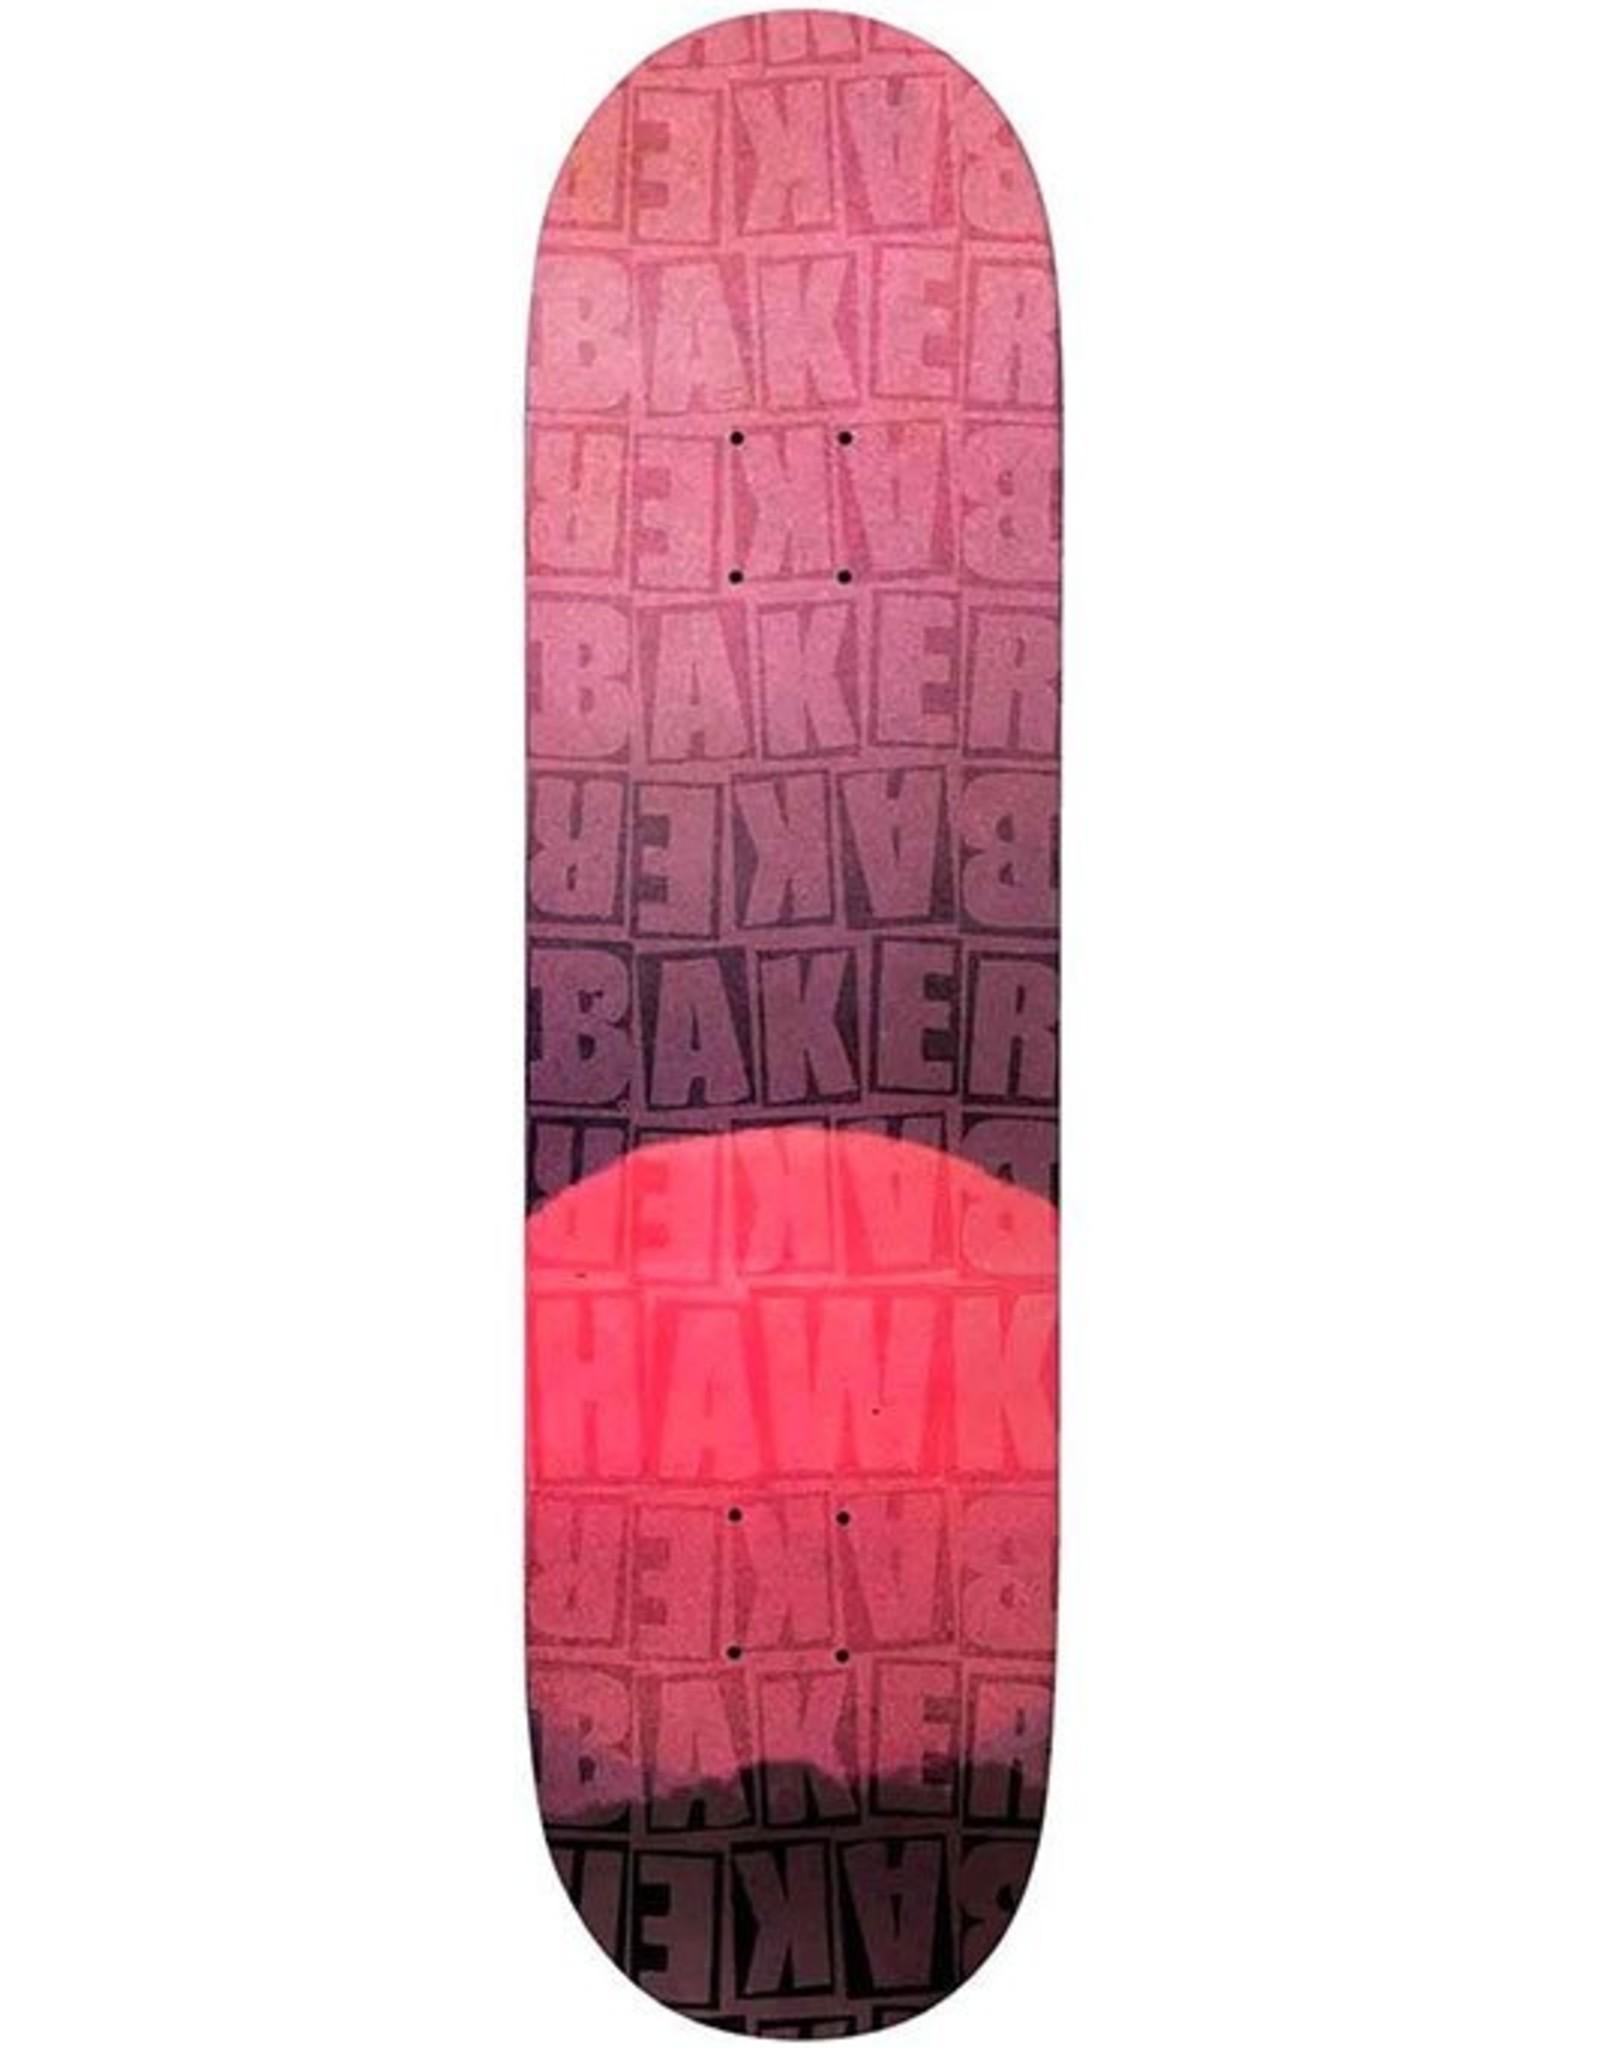 Baker BAKER Hawk Pile Red Deck (8.125)